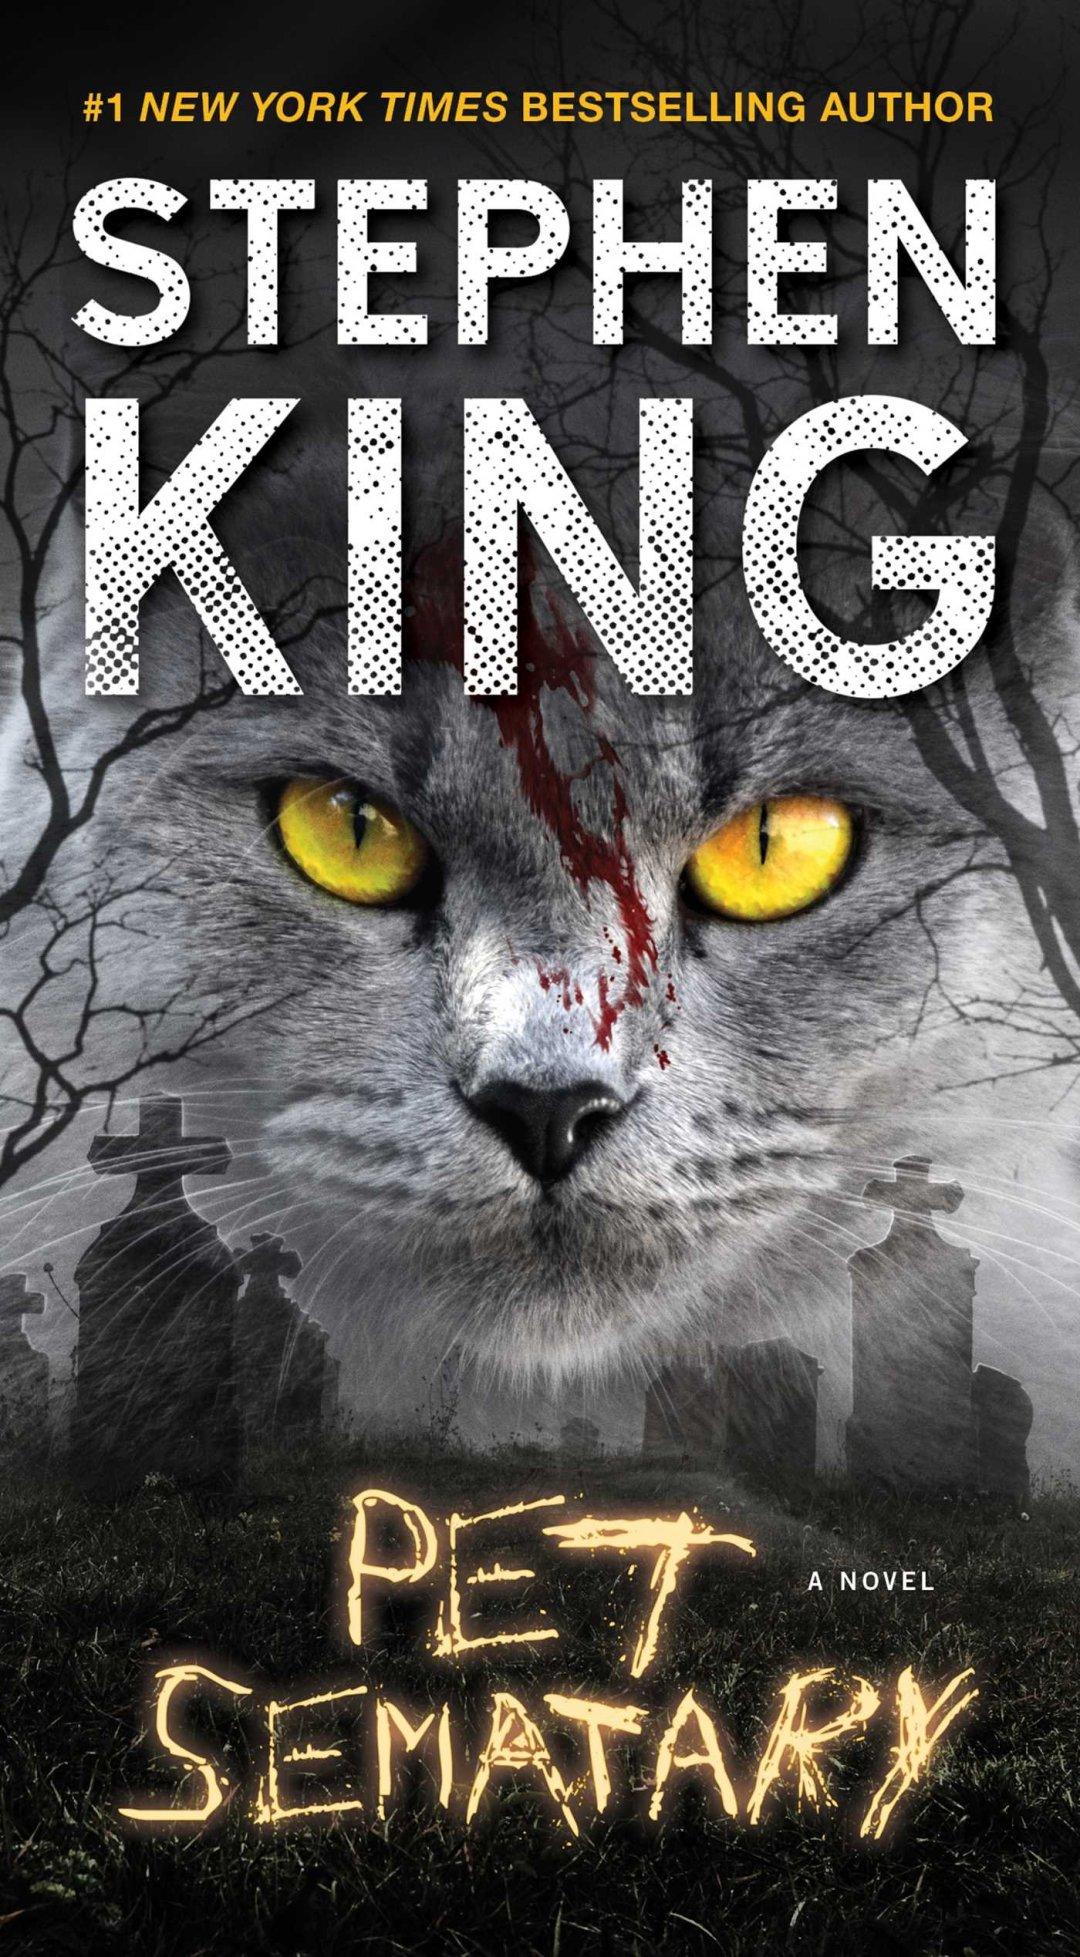 Pet Sematary: A Novel: King, Stephen: 9781501156700: Amazon.com: Books